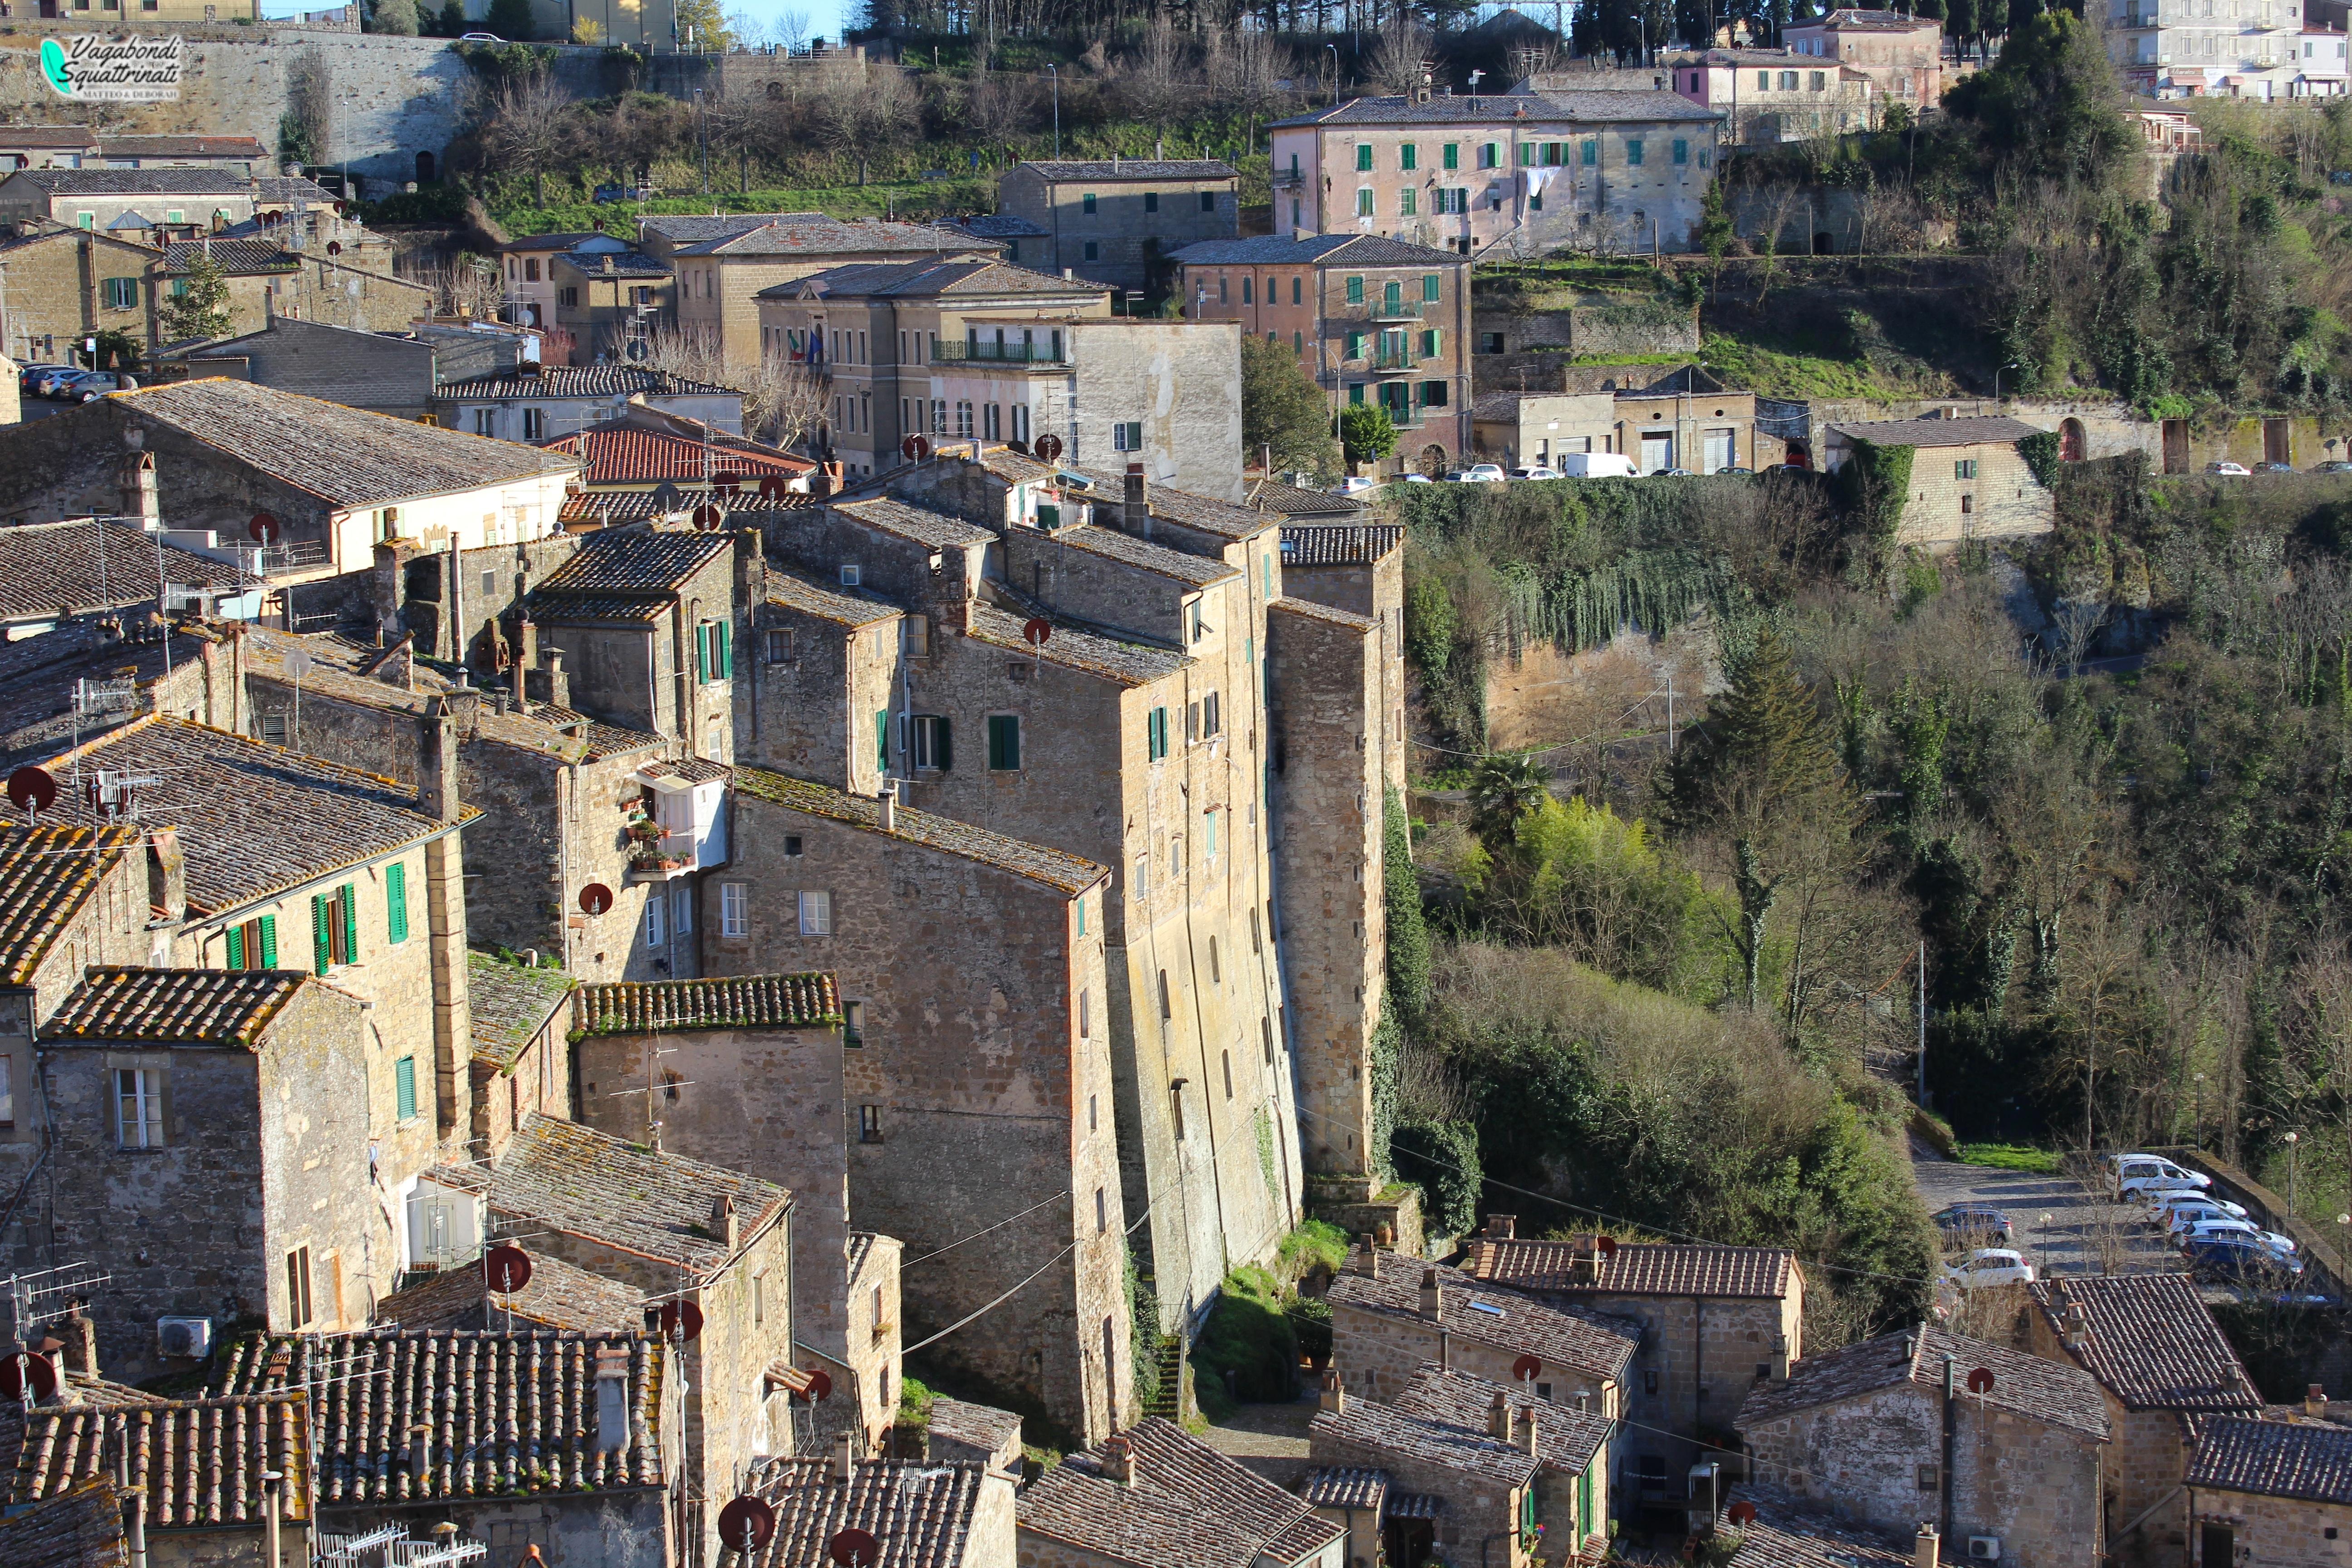 I borghi del tufo in Toscana: Sorano